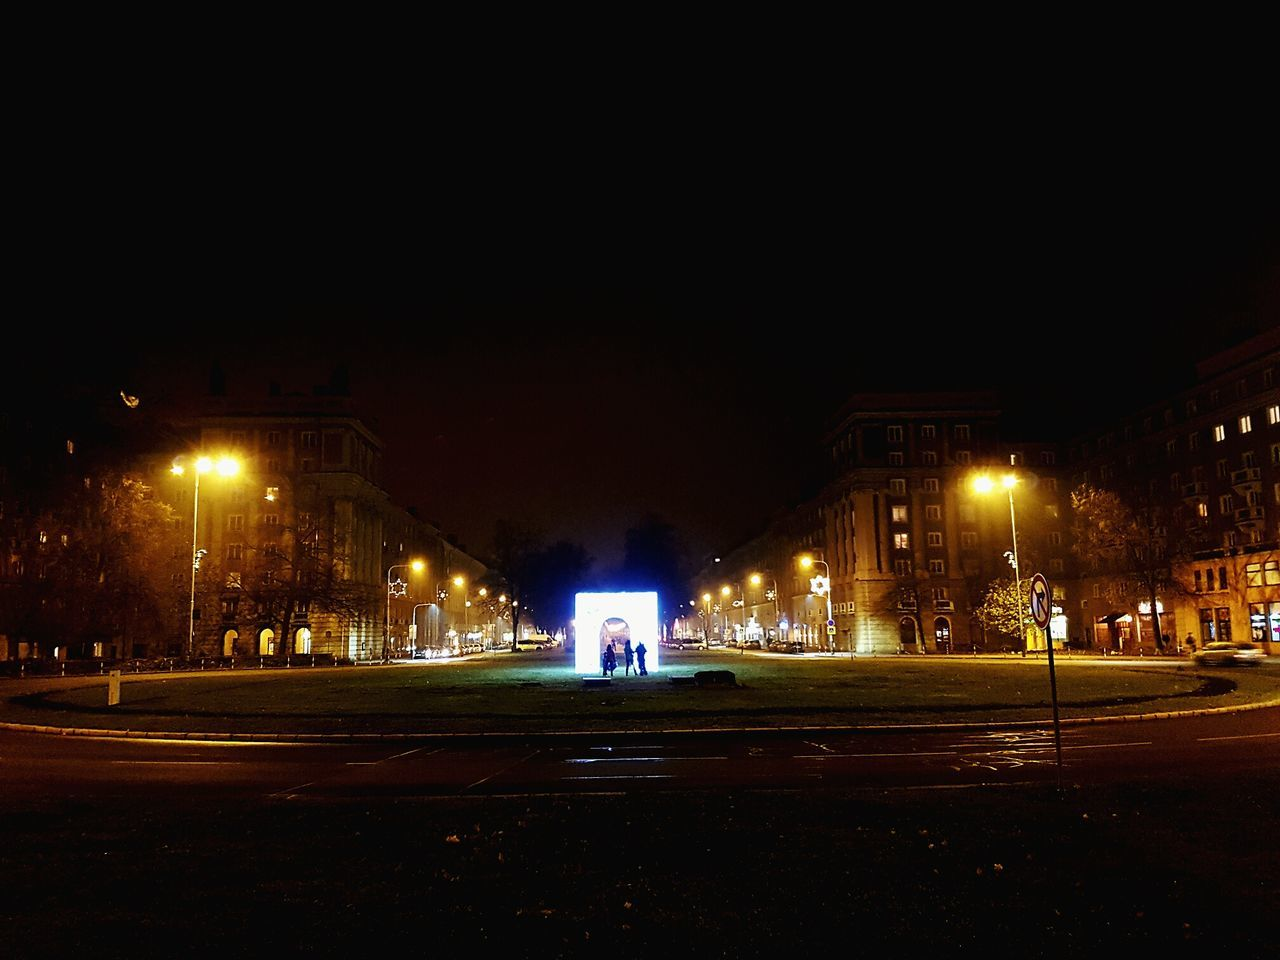 Night No People Outdoors Gas Station Sky Czech Republic🇨🇿 Night Lights Road Illuminated Ostrava Christmas Decoration Gate Plaza City Ufo Light